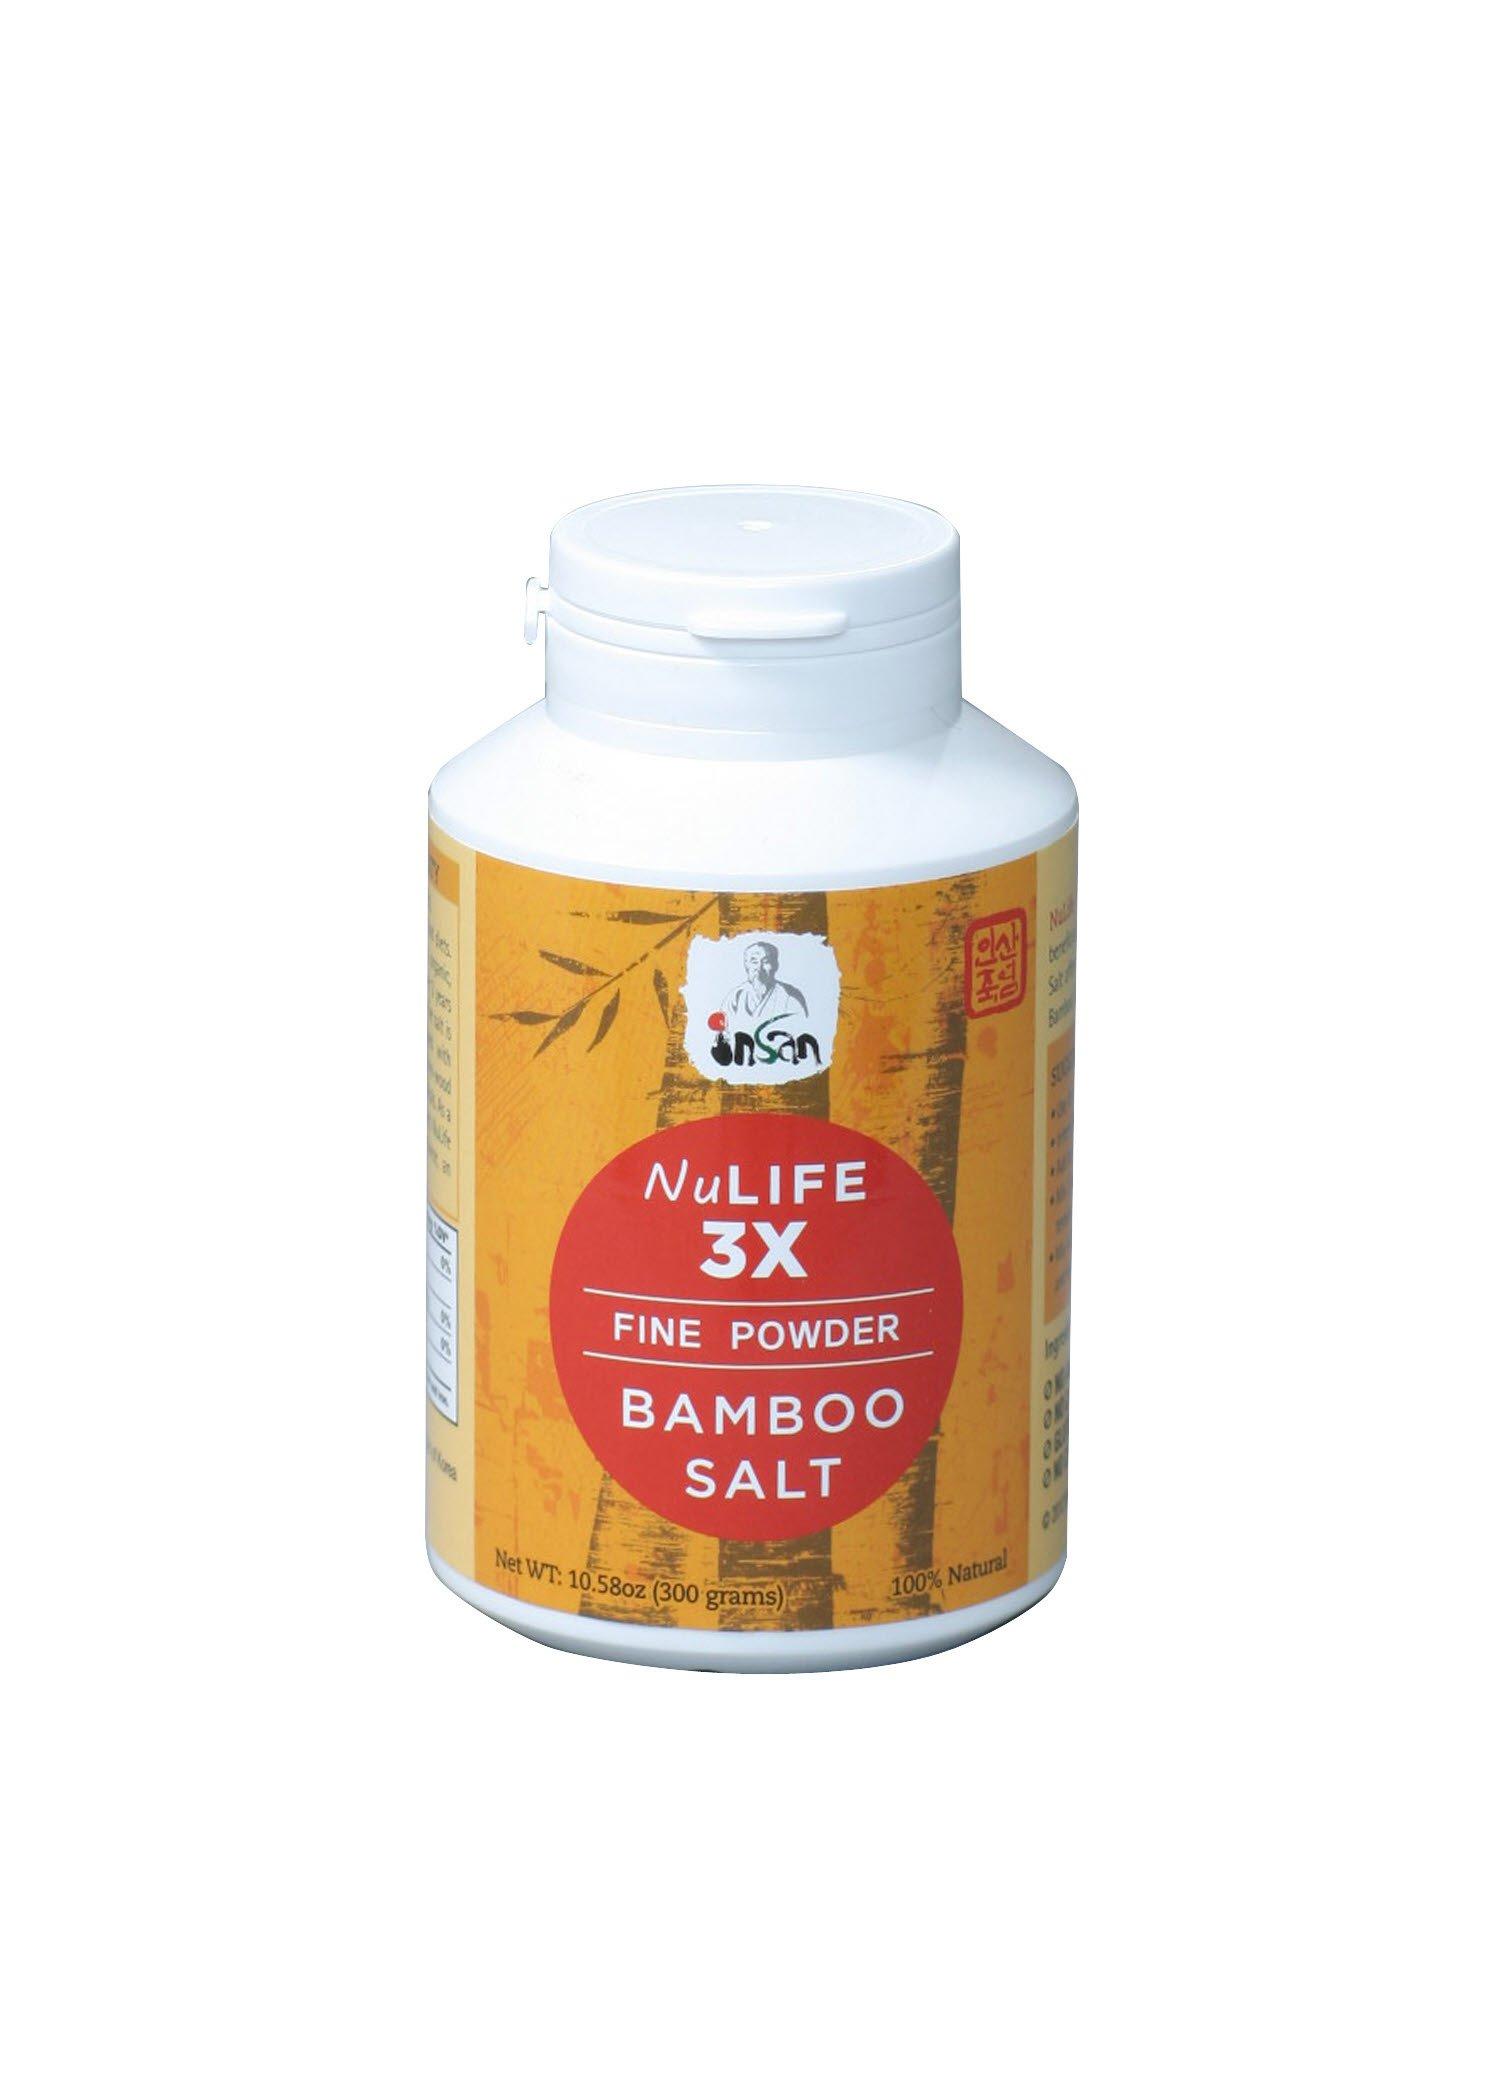 NuLife 3x Roasted Bamboo Salt (Powder) 300g by My Bamboo Salt (Image #1)